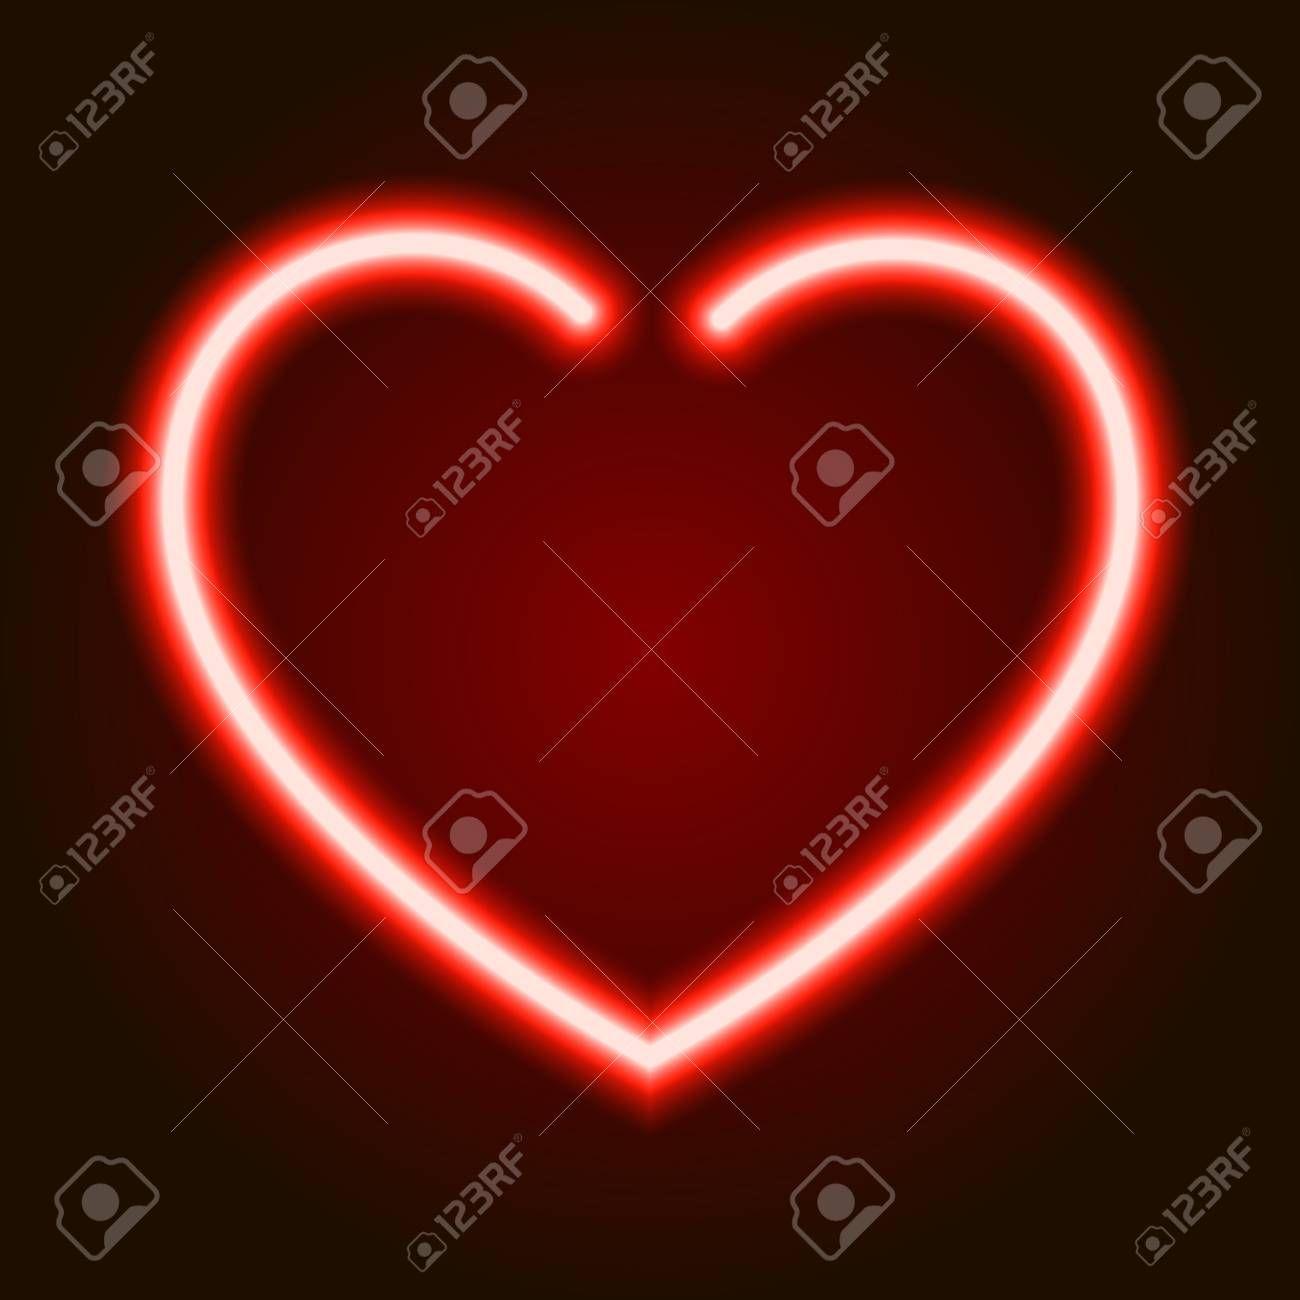 Red neon glowing heart symbol of love on dark background